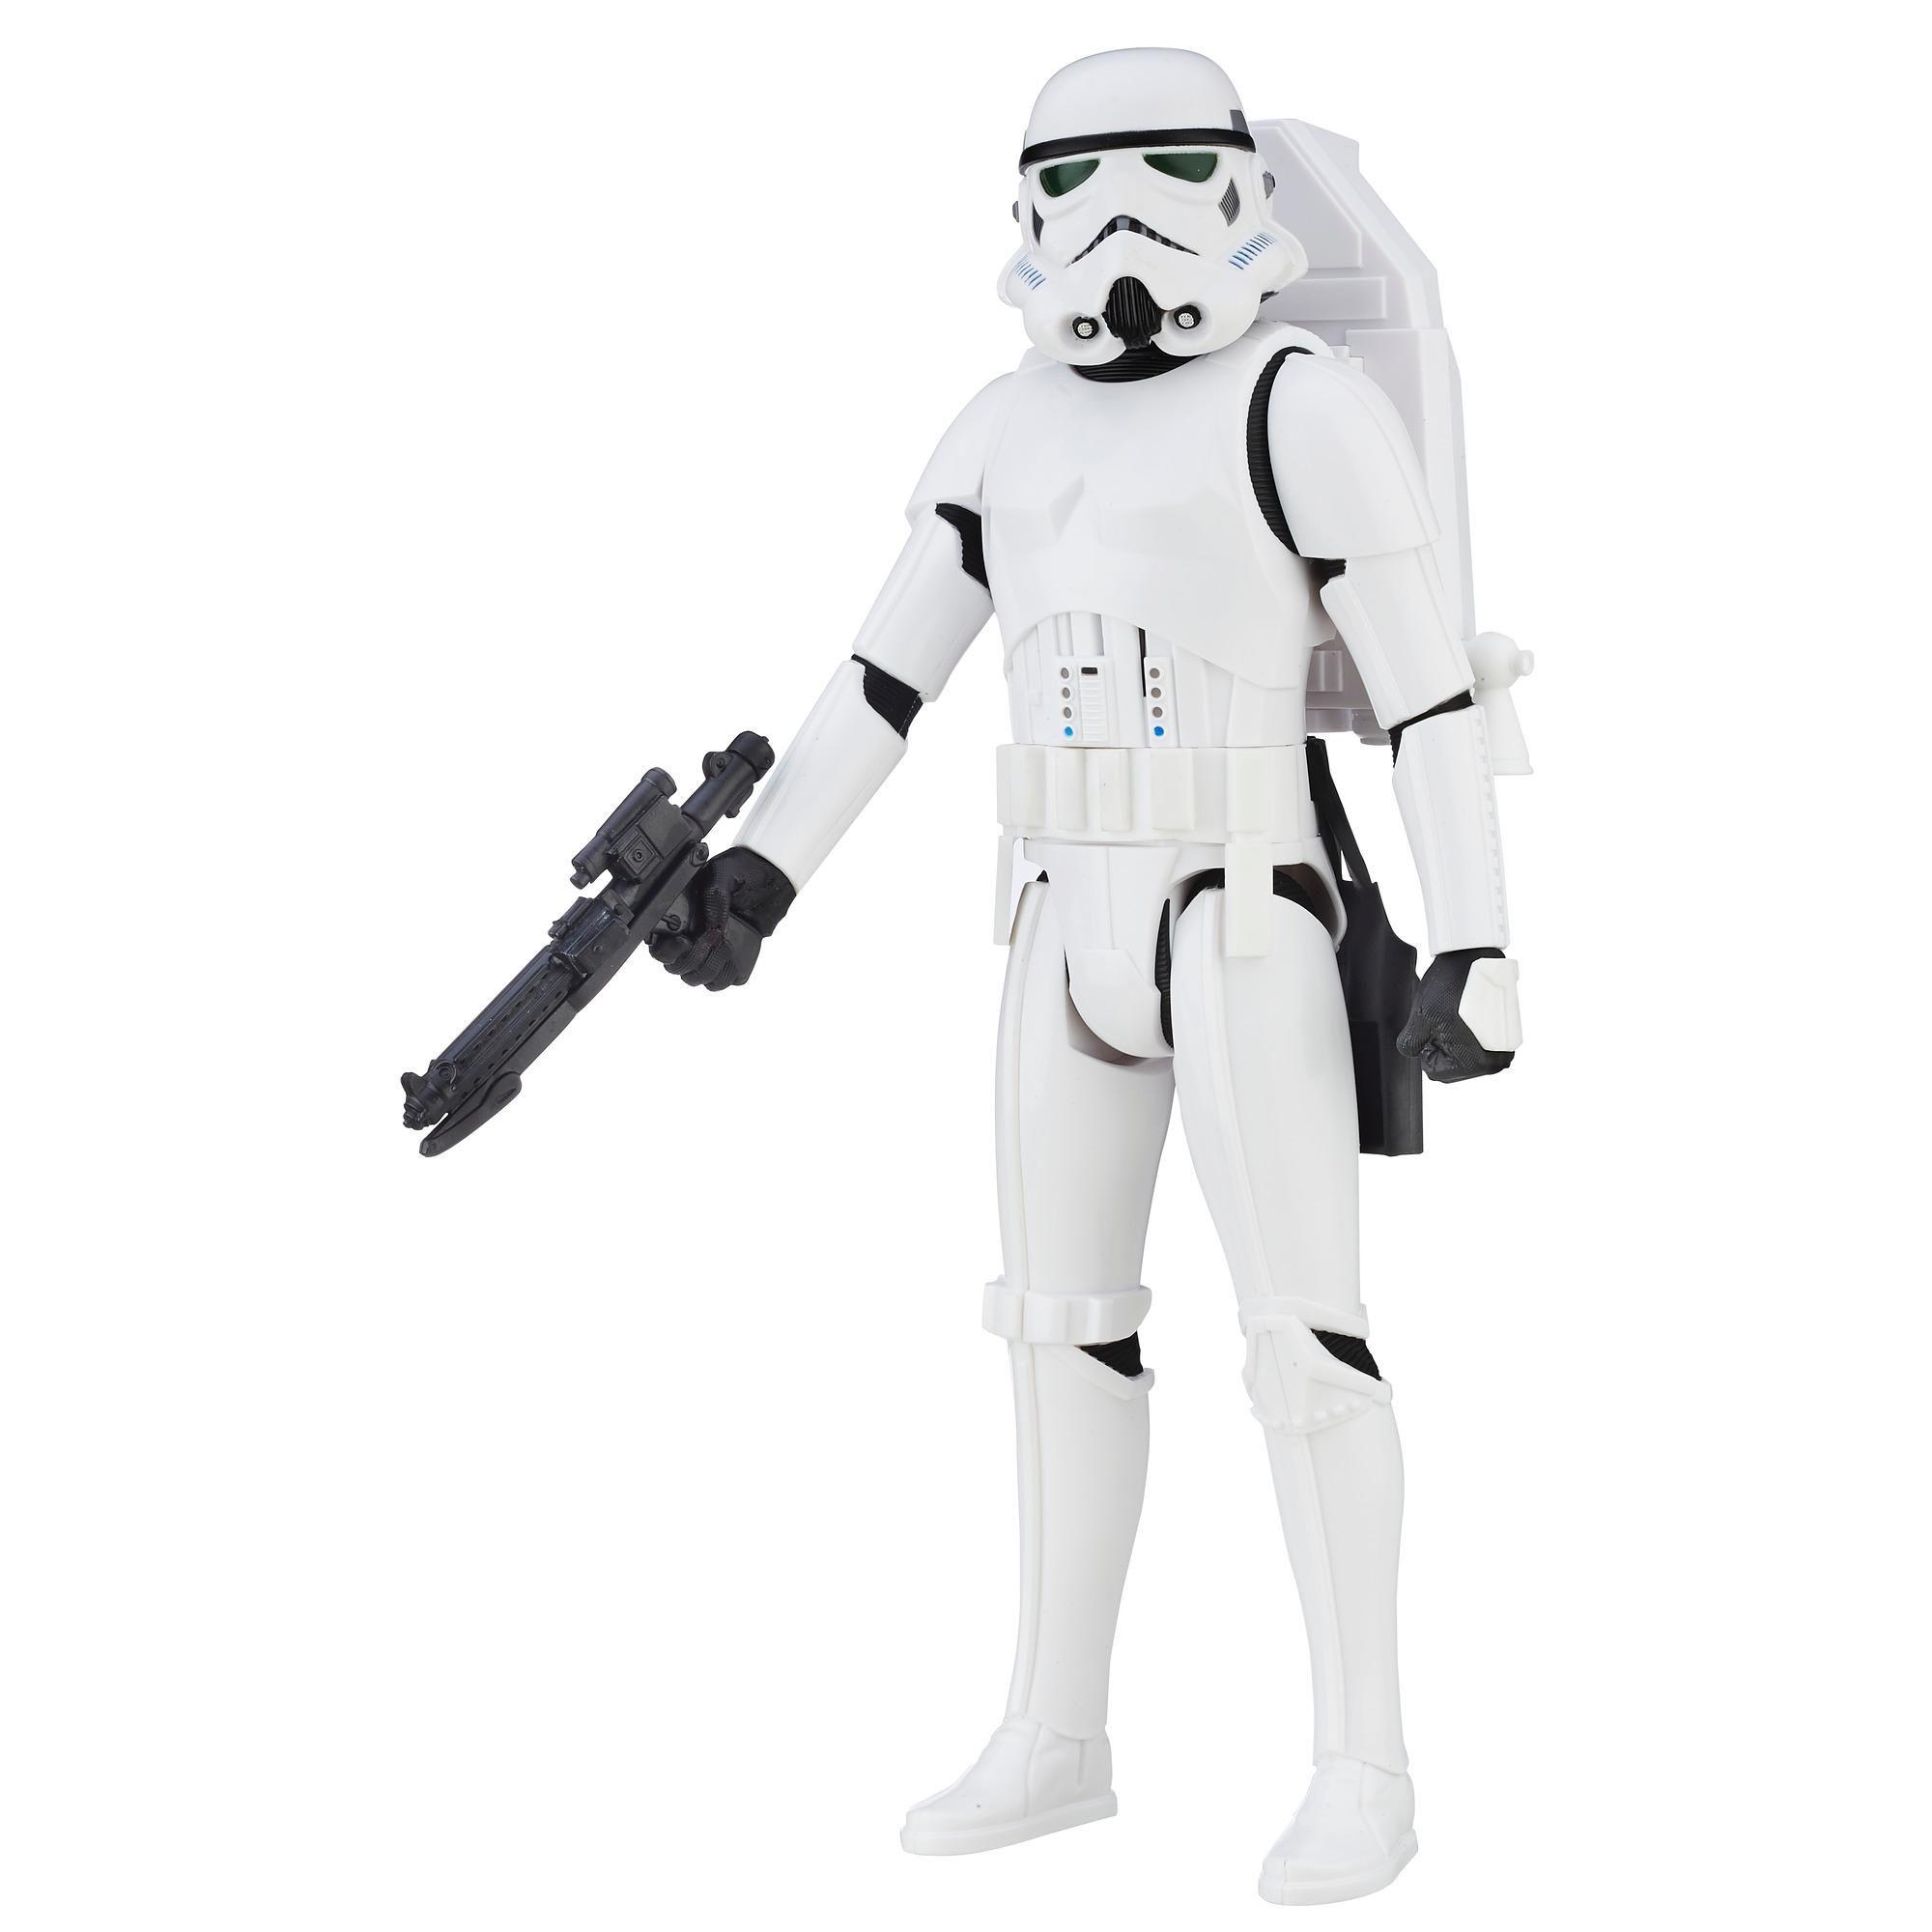 Boneco  Star Wars Stormtrooper Eletronico Interactech - Hasbro